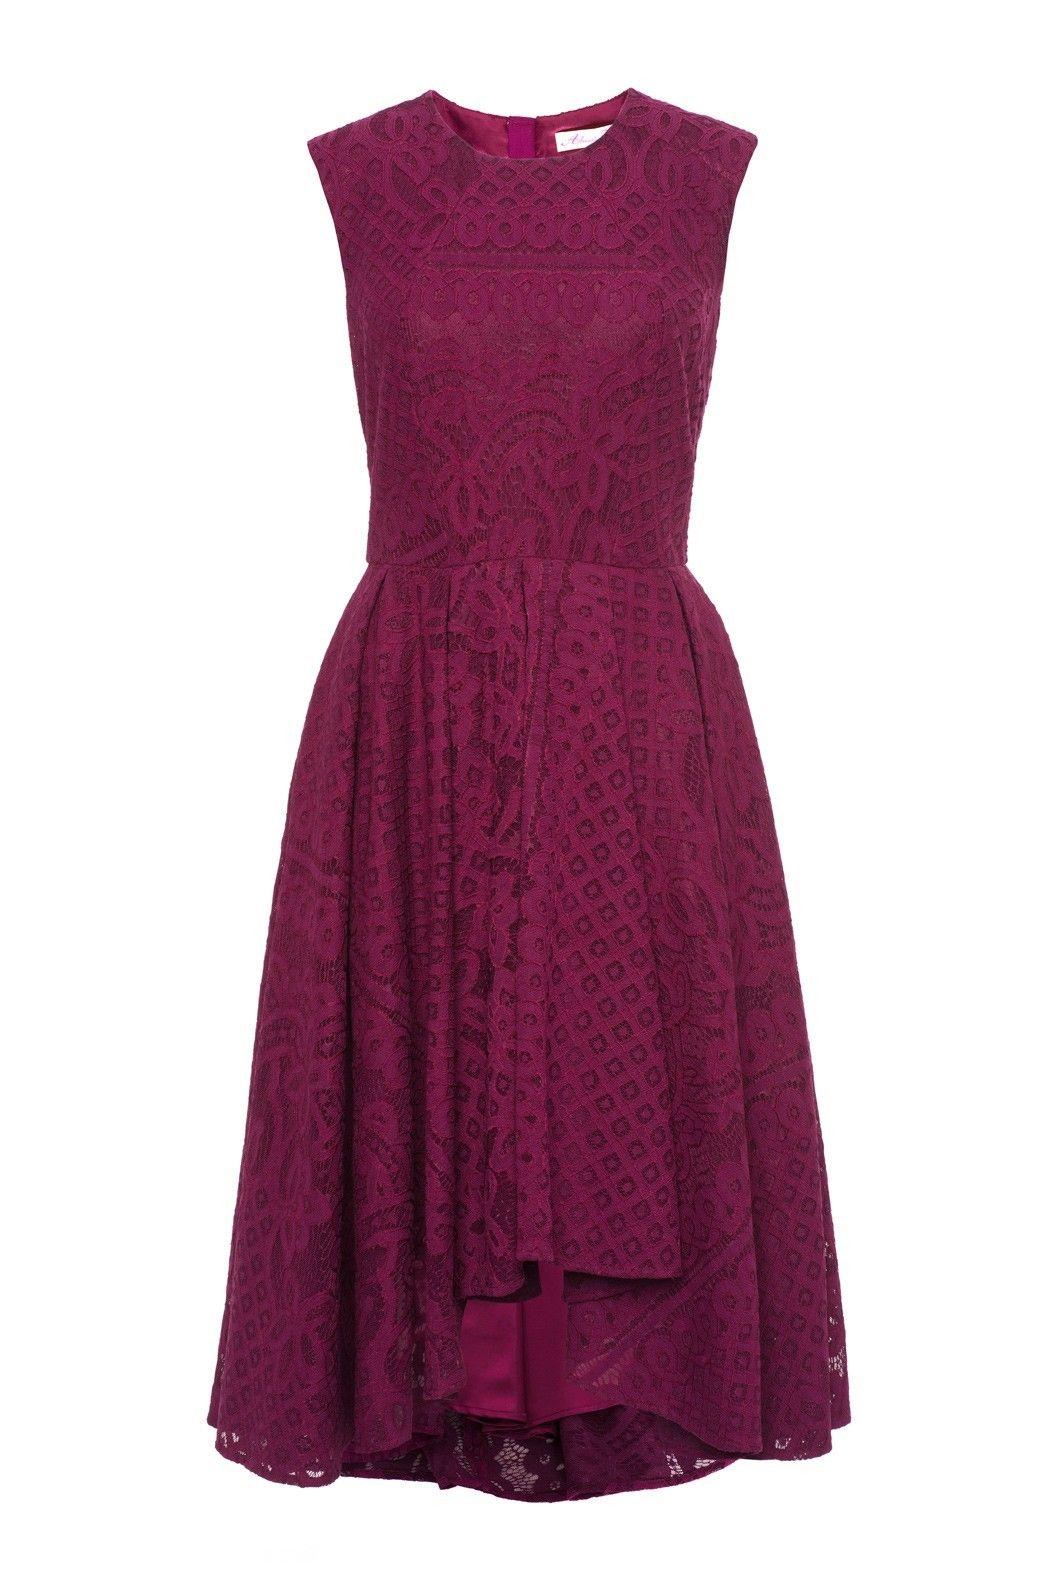 Alannah hill black strapless dress